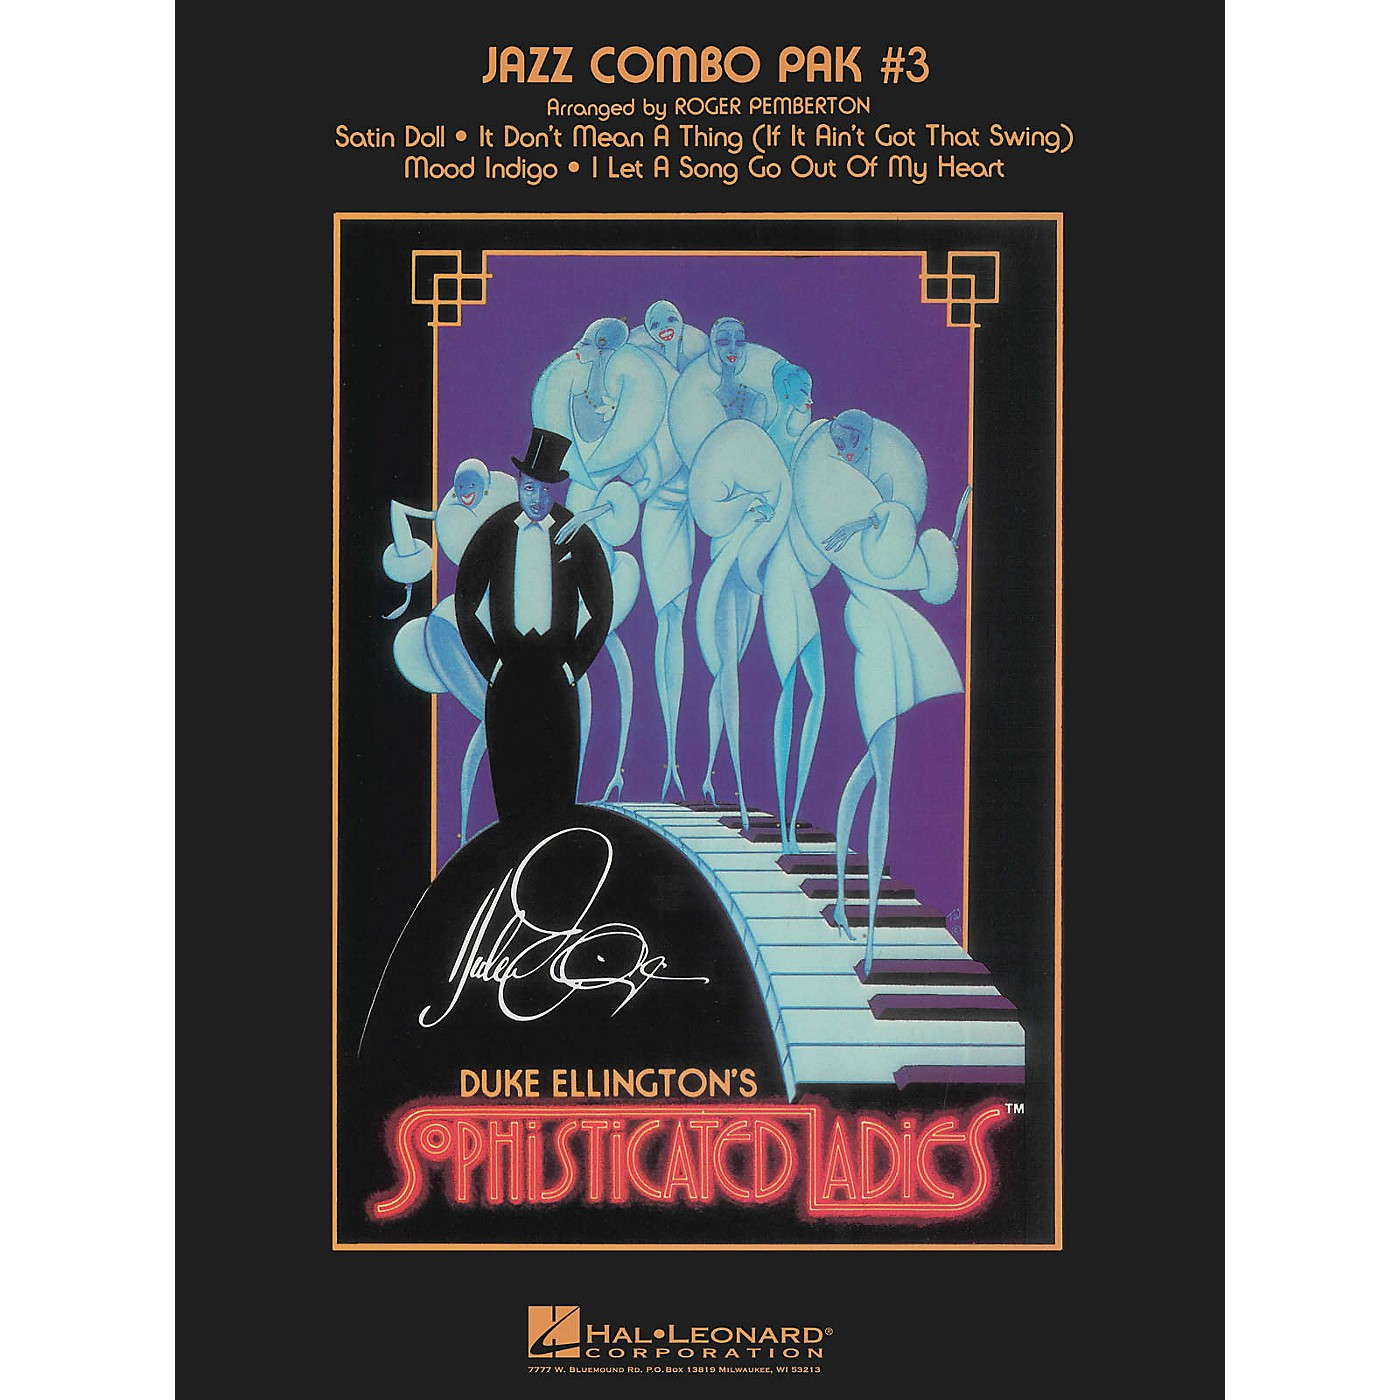 Hal Leonard Jazz Combo Pak #3 (with audio download) Jazz Band Level 3-4 Arranged by Roger Pemberton thumbnail